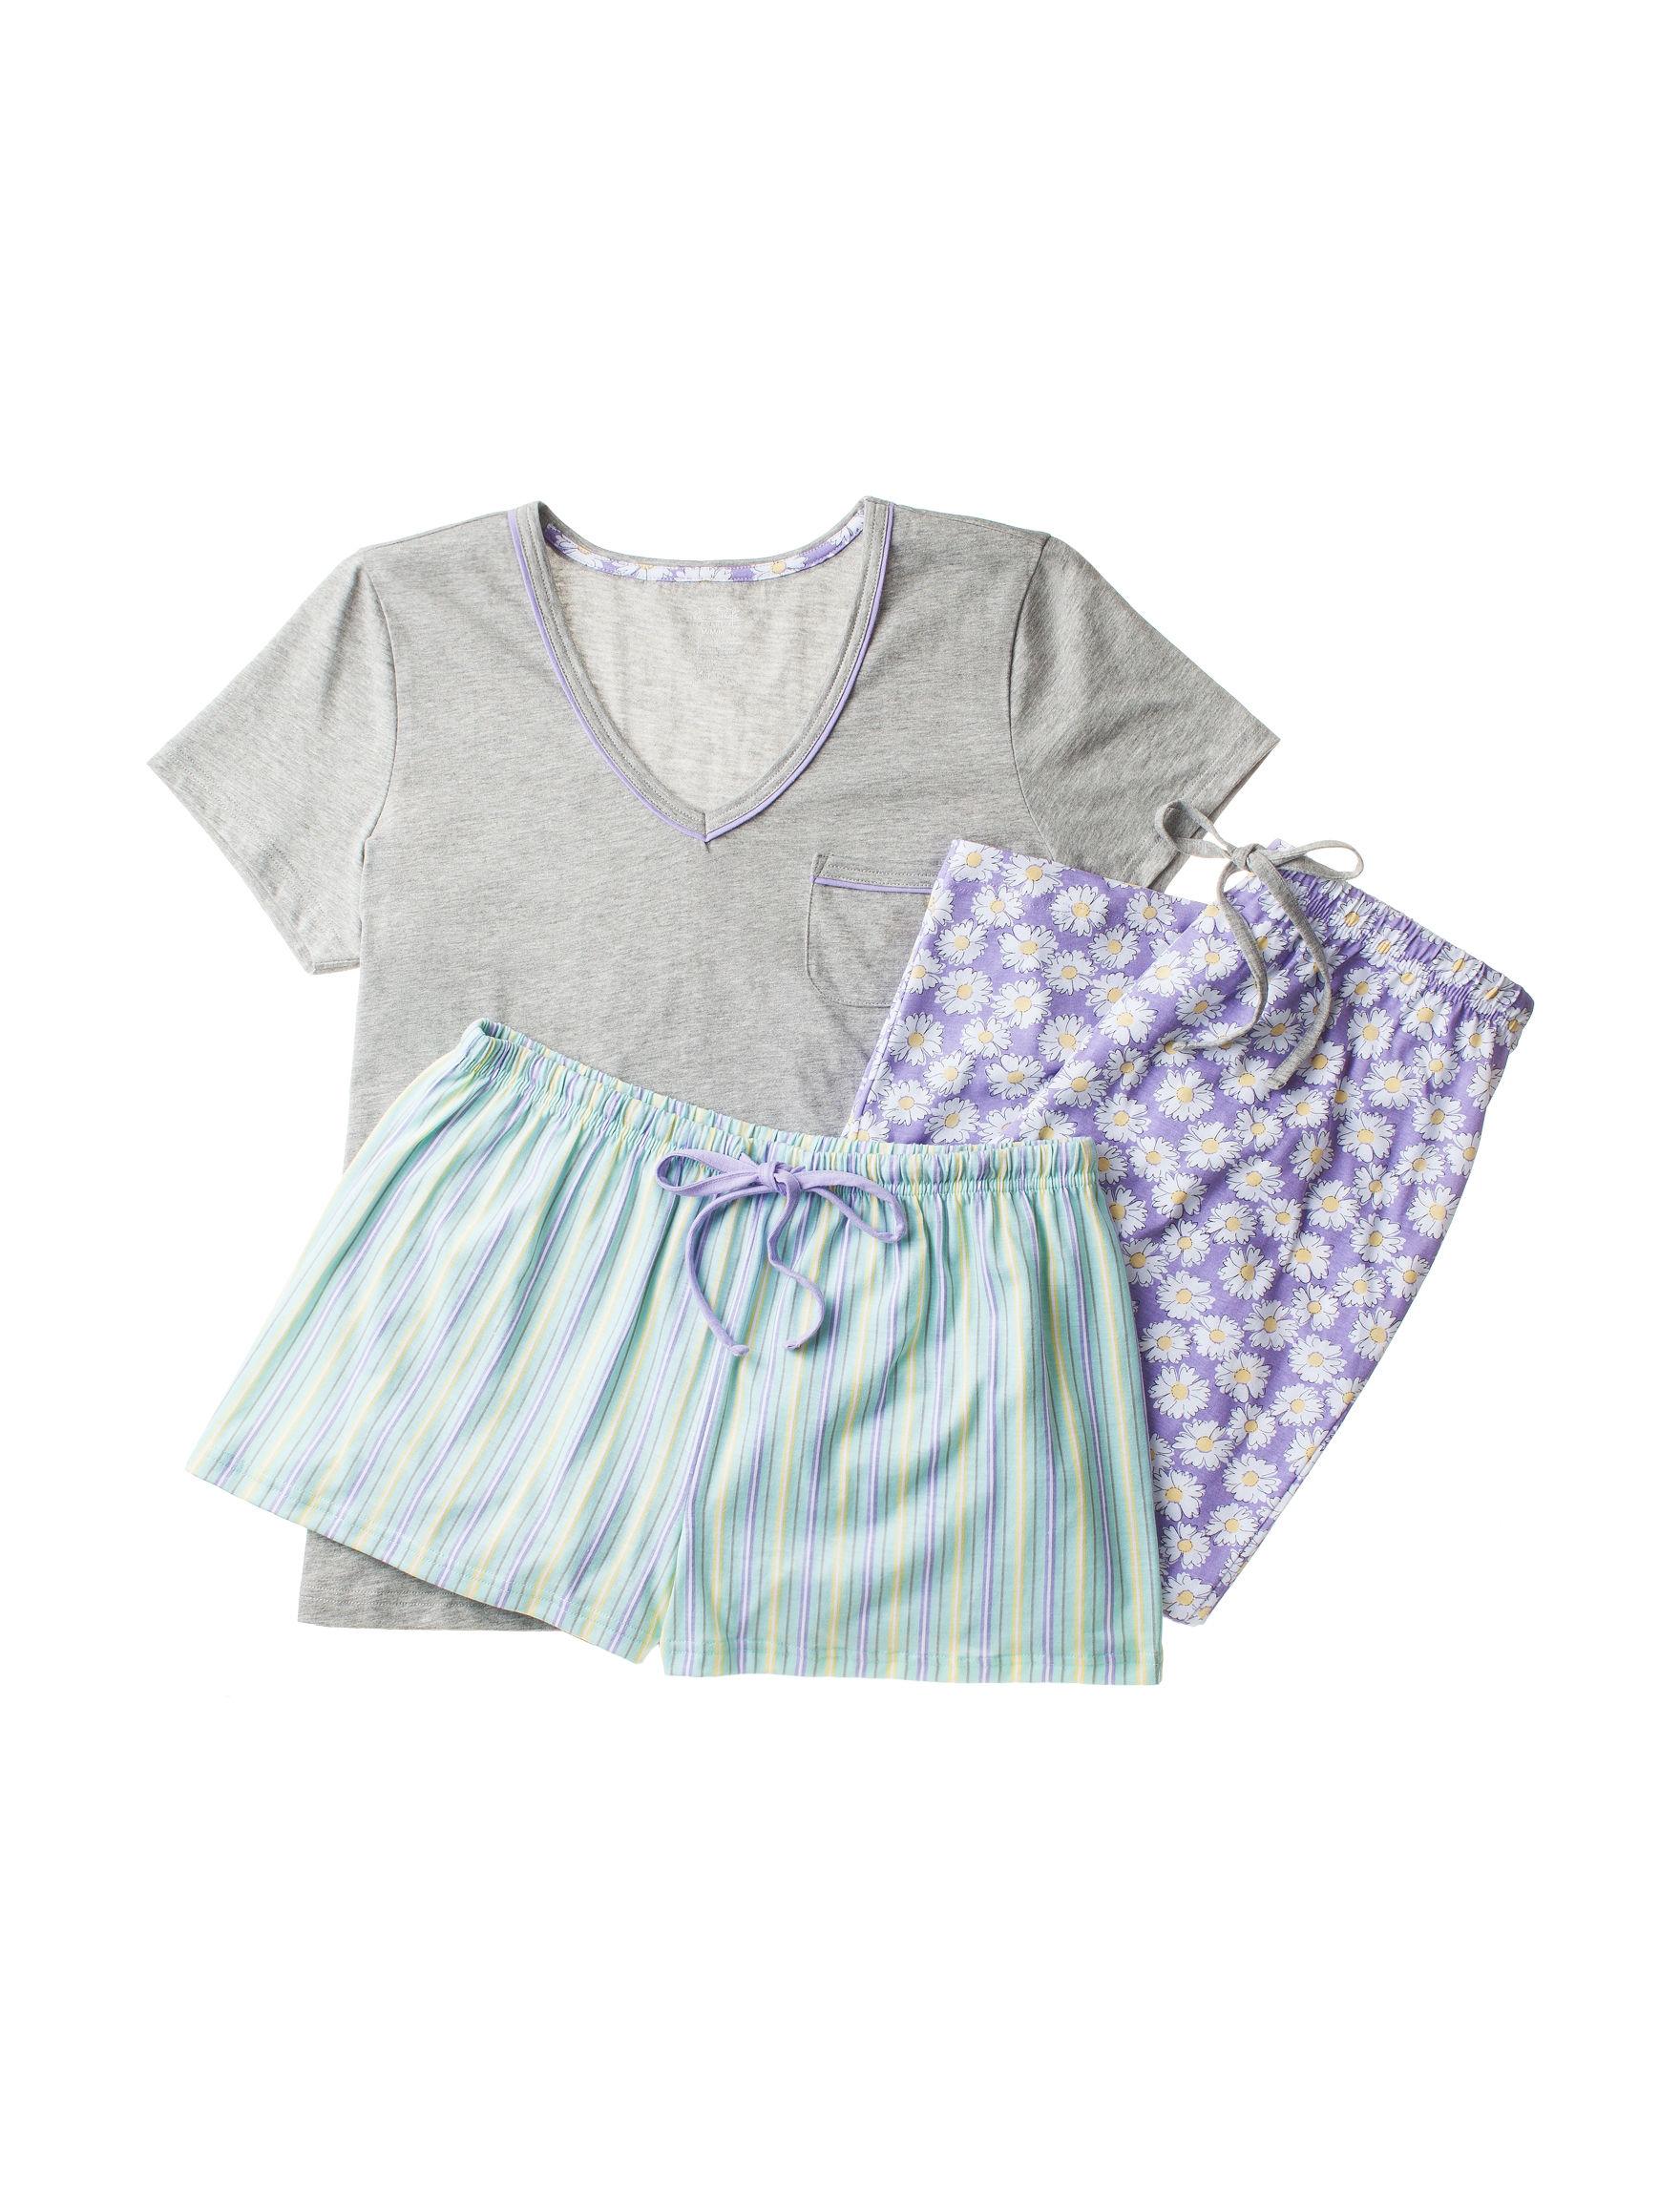 Rene Rofe Grey Multi Pajama Sets